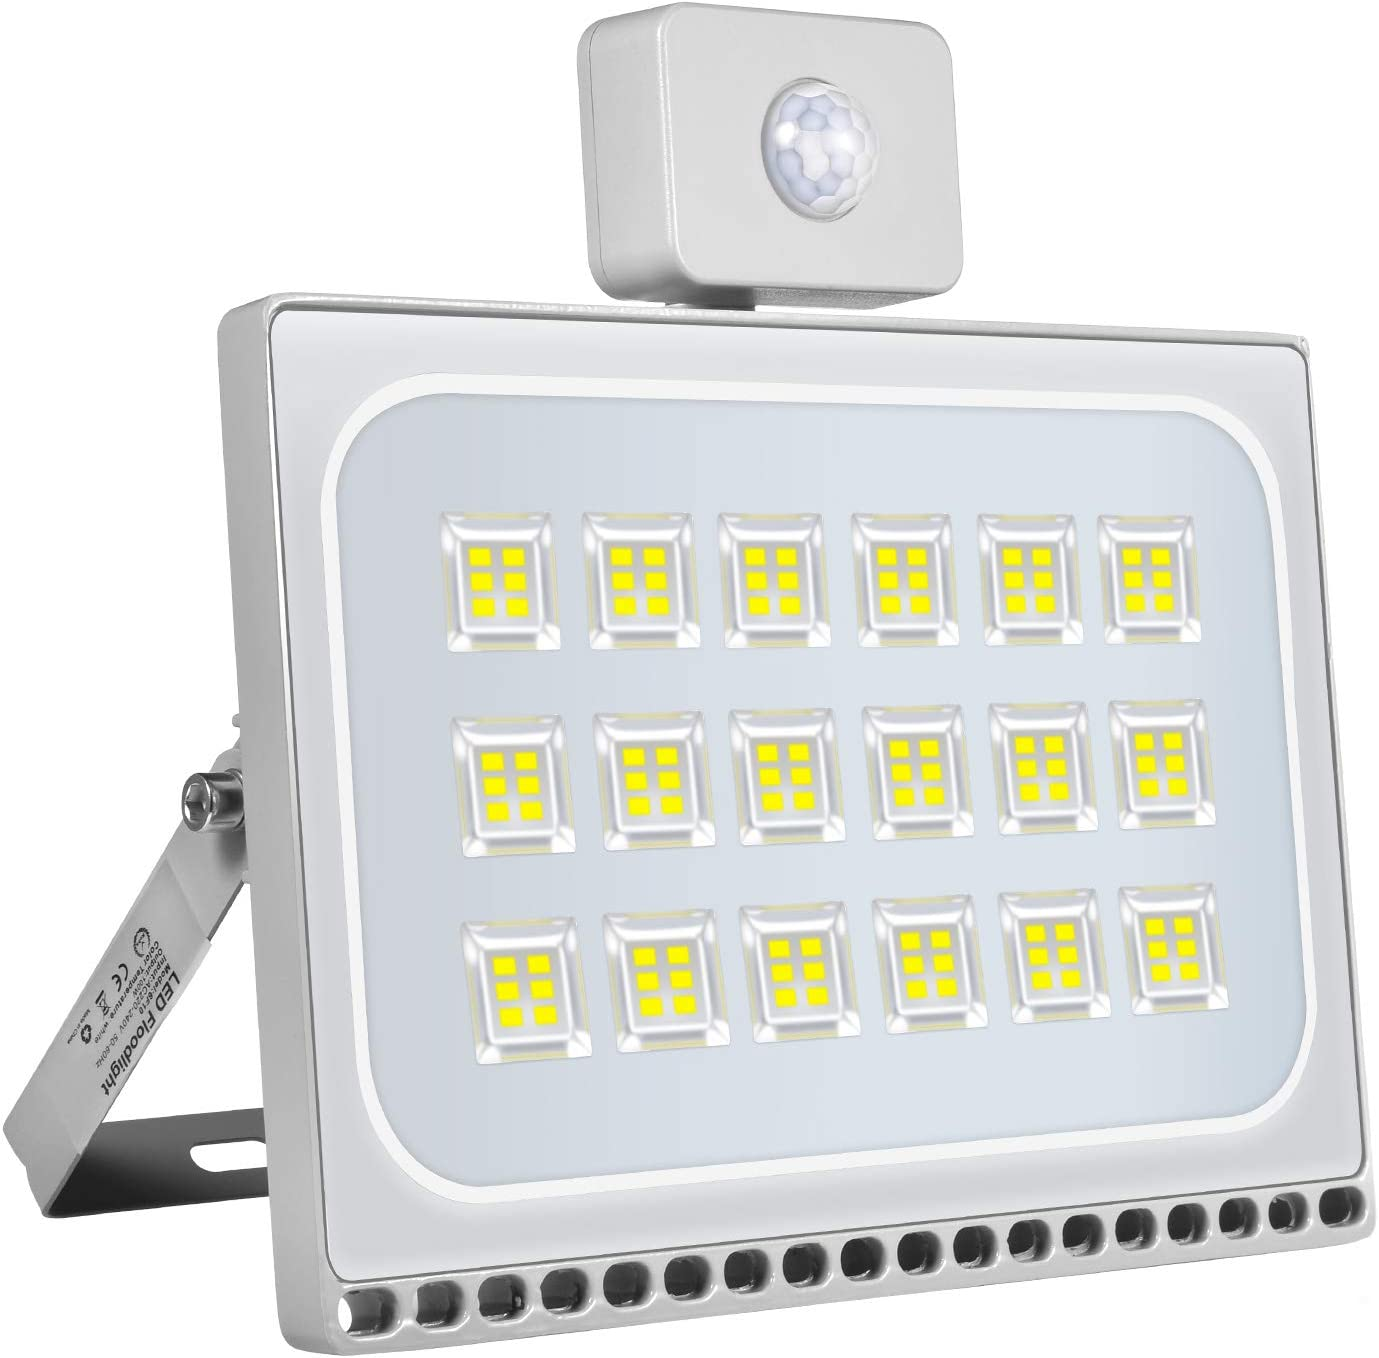 Led Motion Sensor Flood Light 6500 Max Max 49% OFF 63% OFF 100W 8000LM Sararoom Outdoor